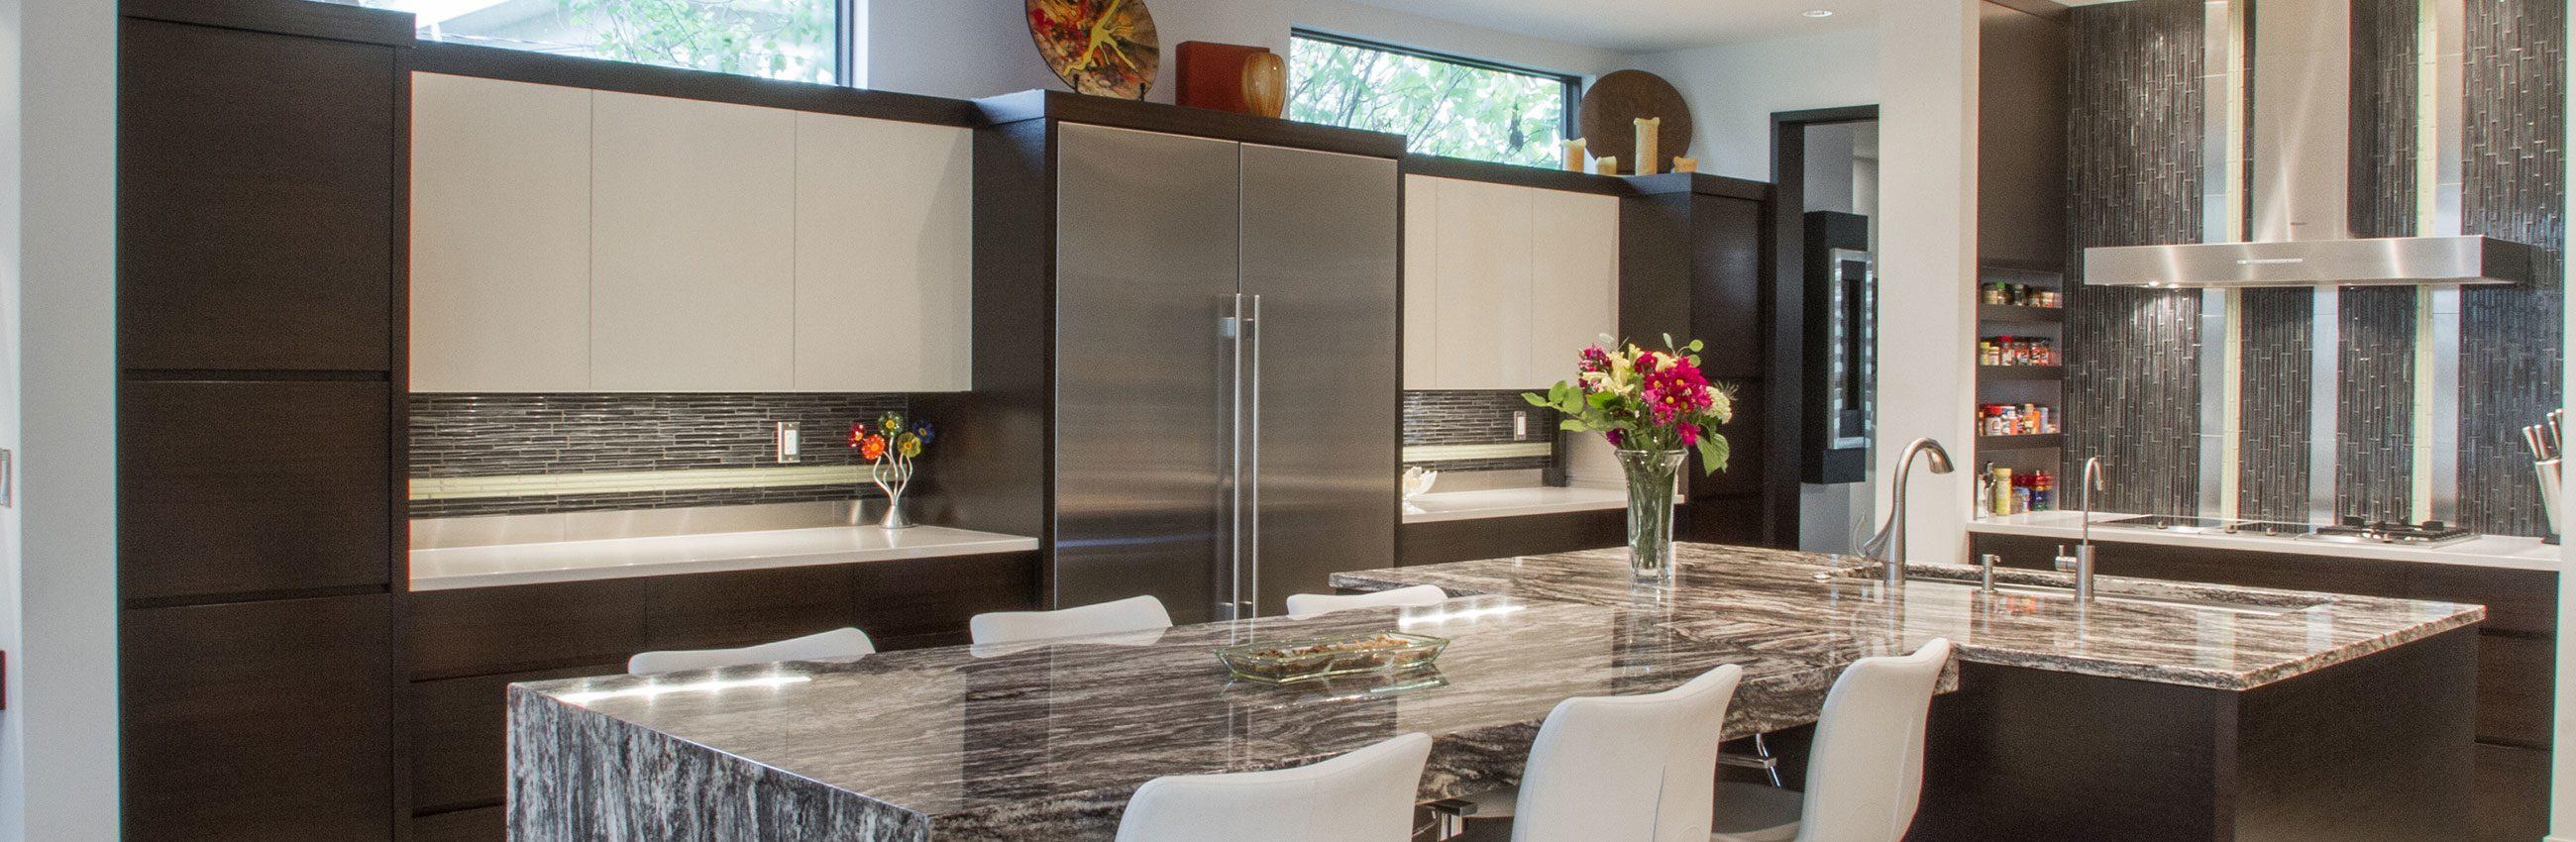 Athena Industries Kitchen Cabinets